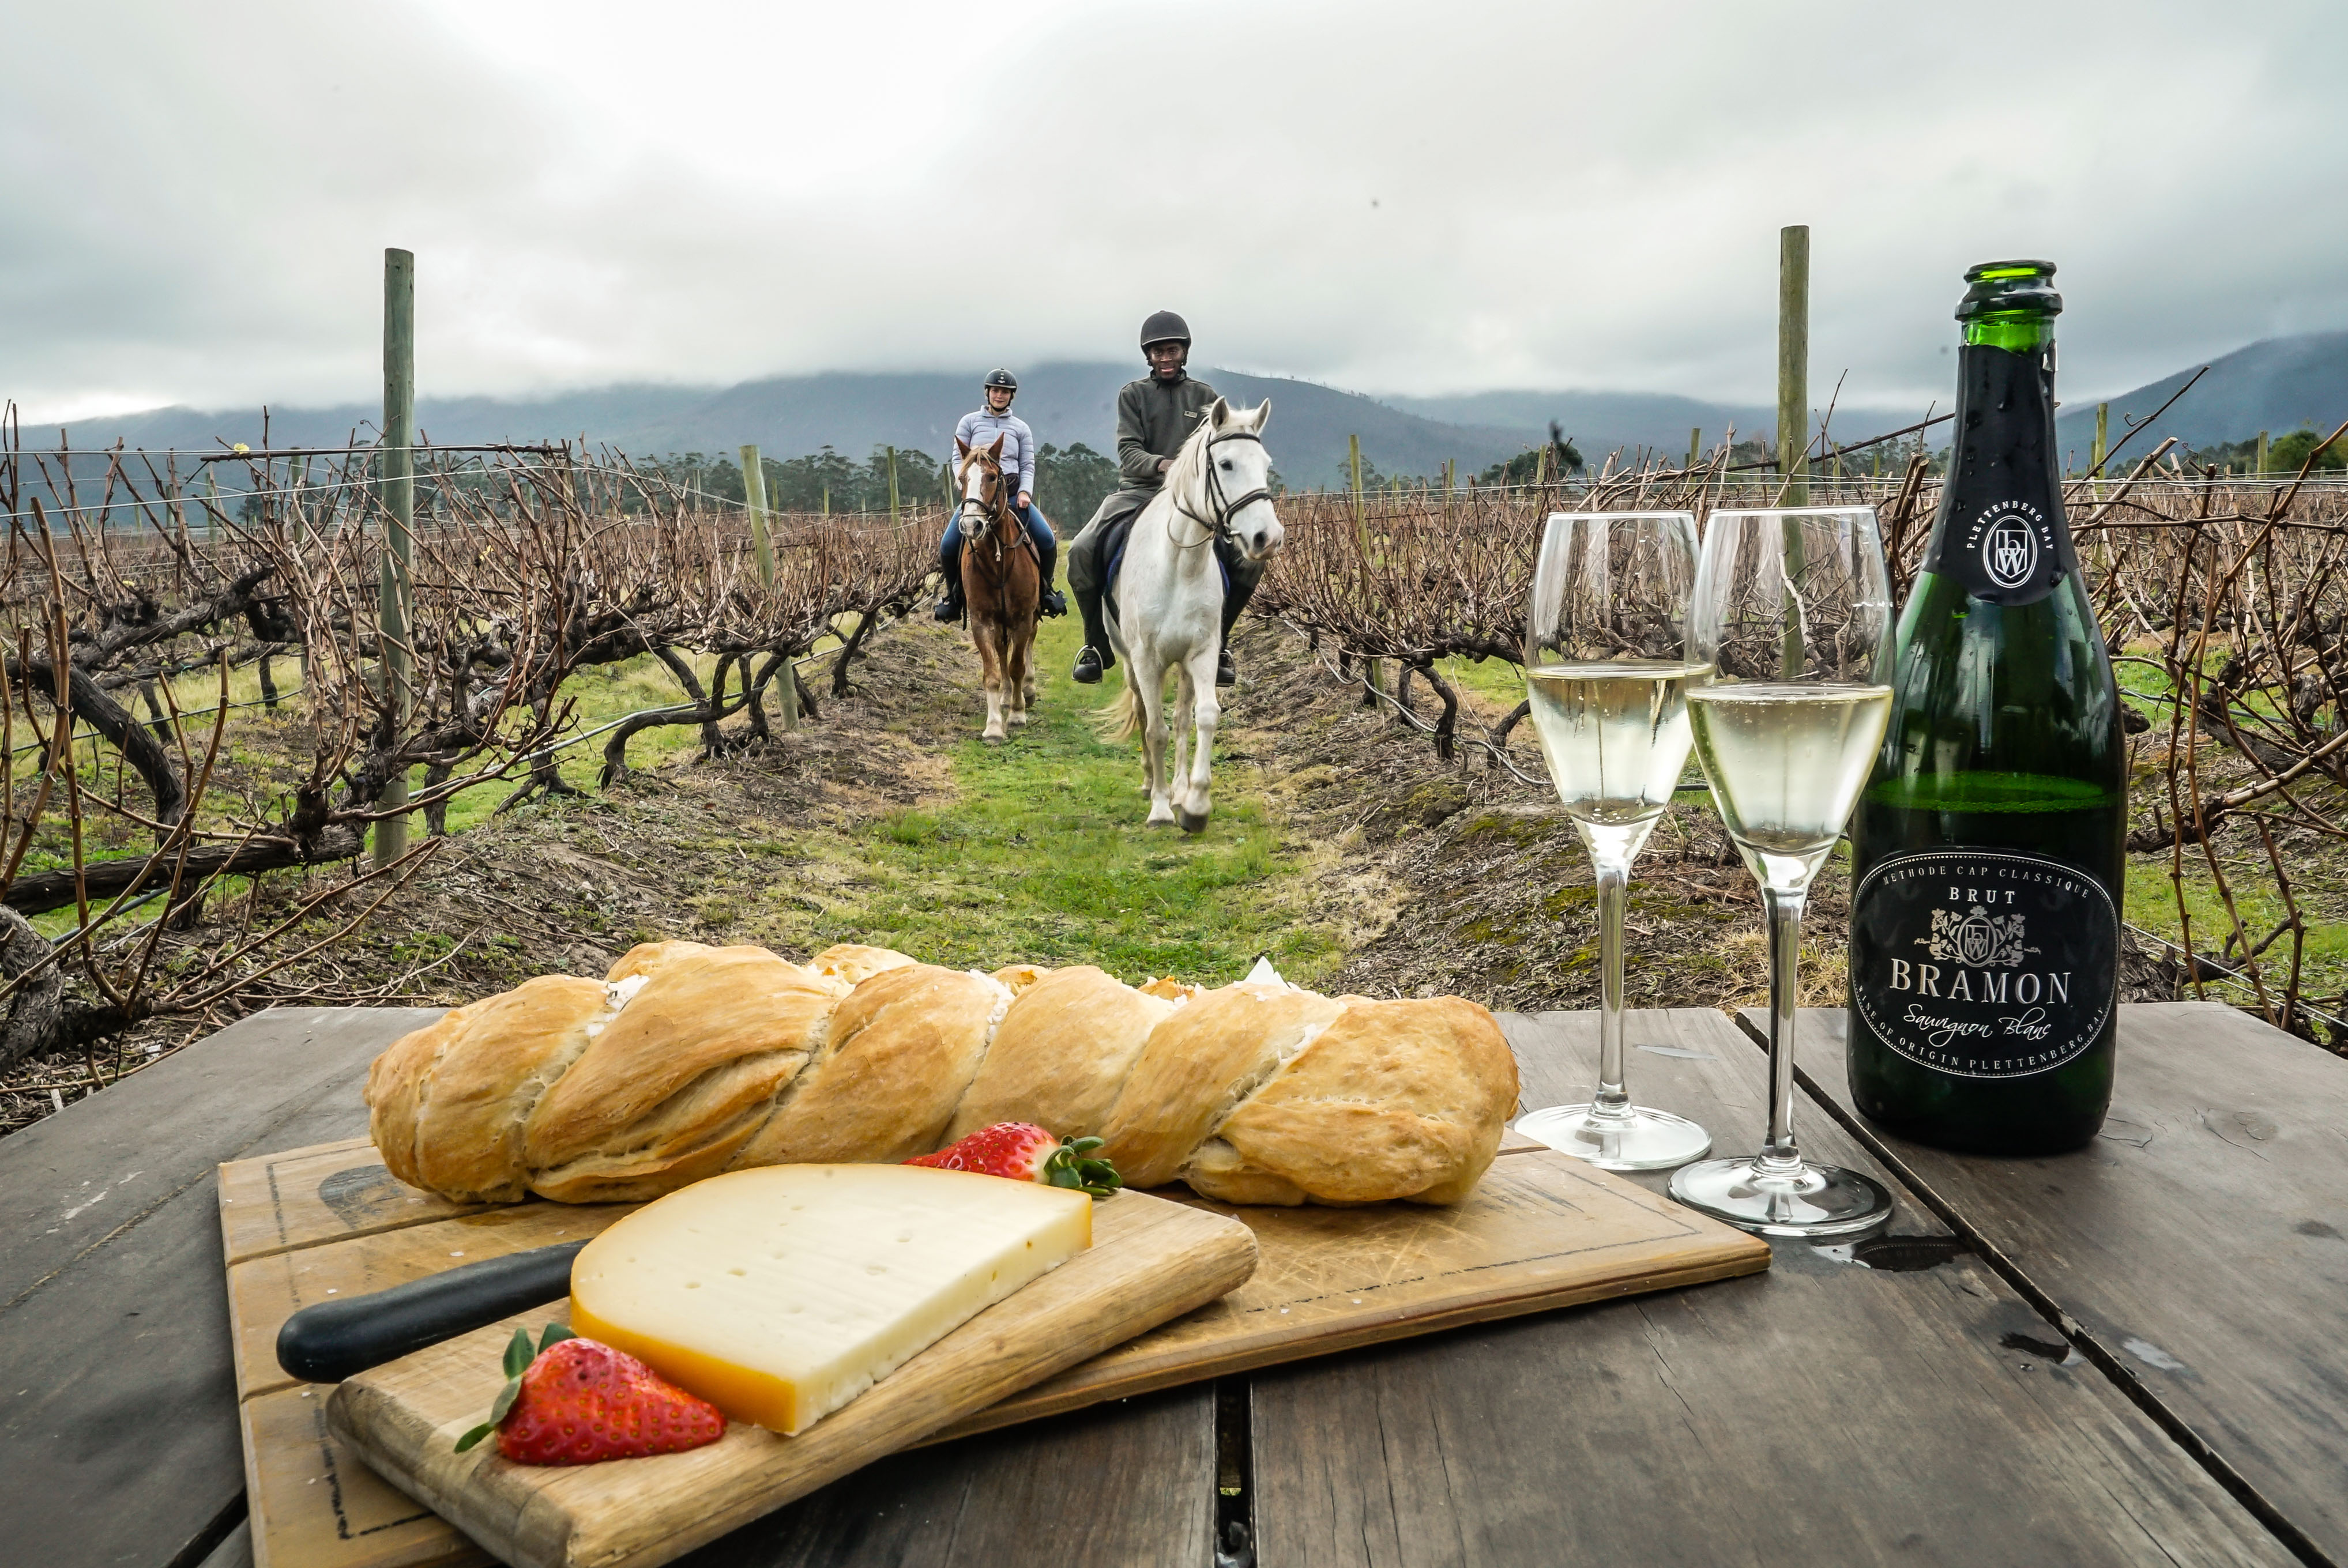 https://www.plettenbergbay.com/userfiles/images/Hog-Hollow-Horse-Trails-Wine-Trail.jpg